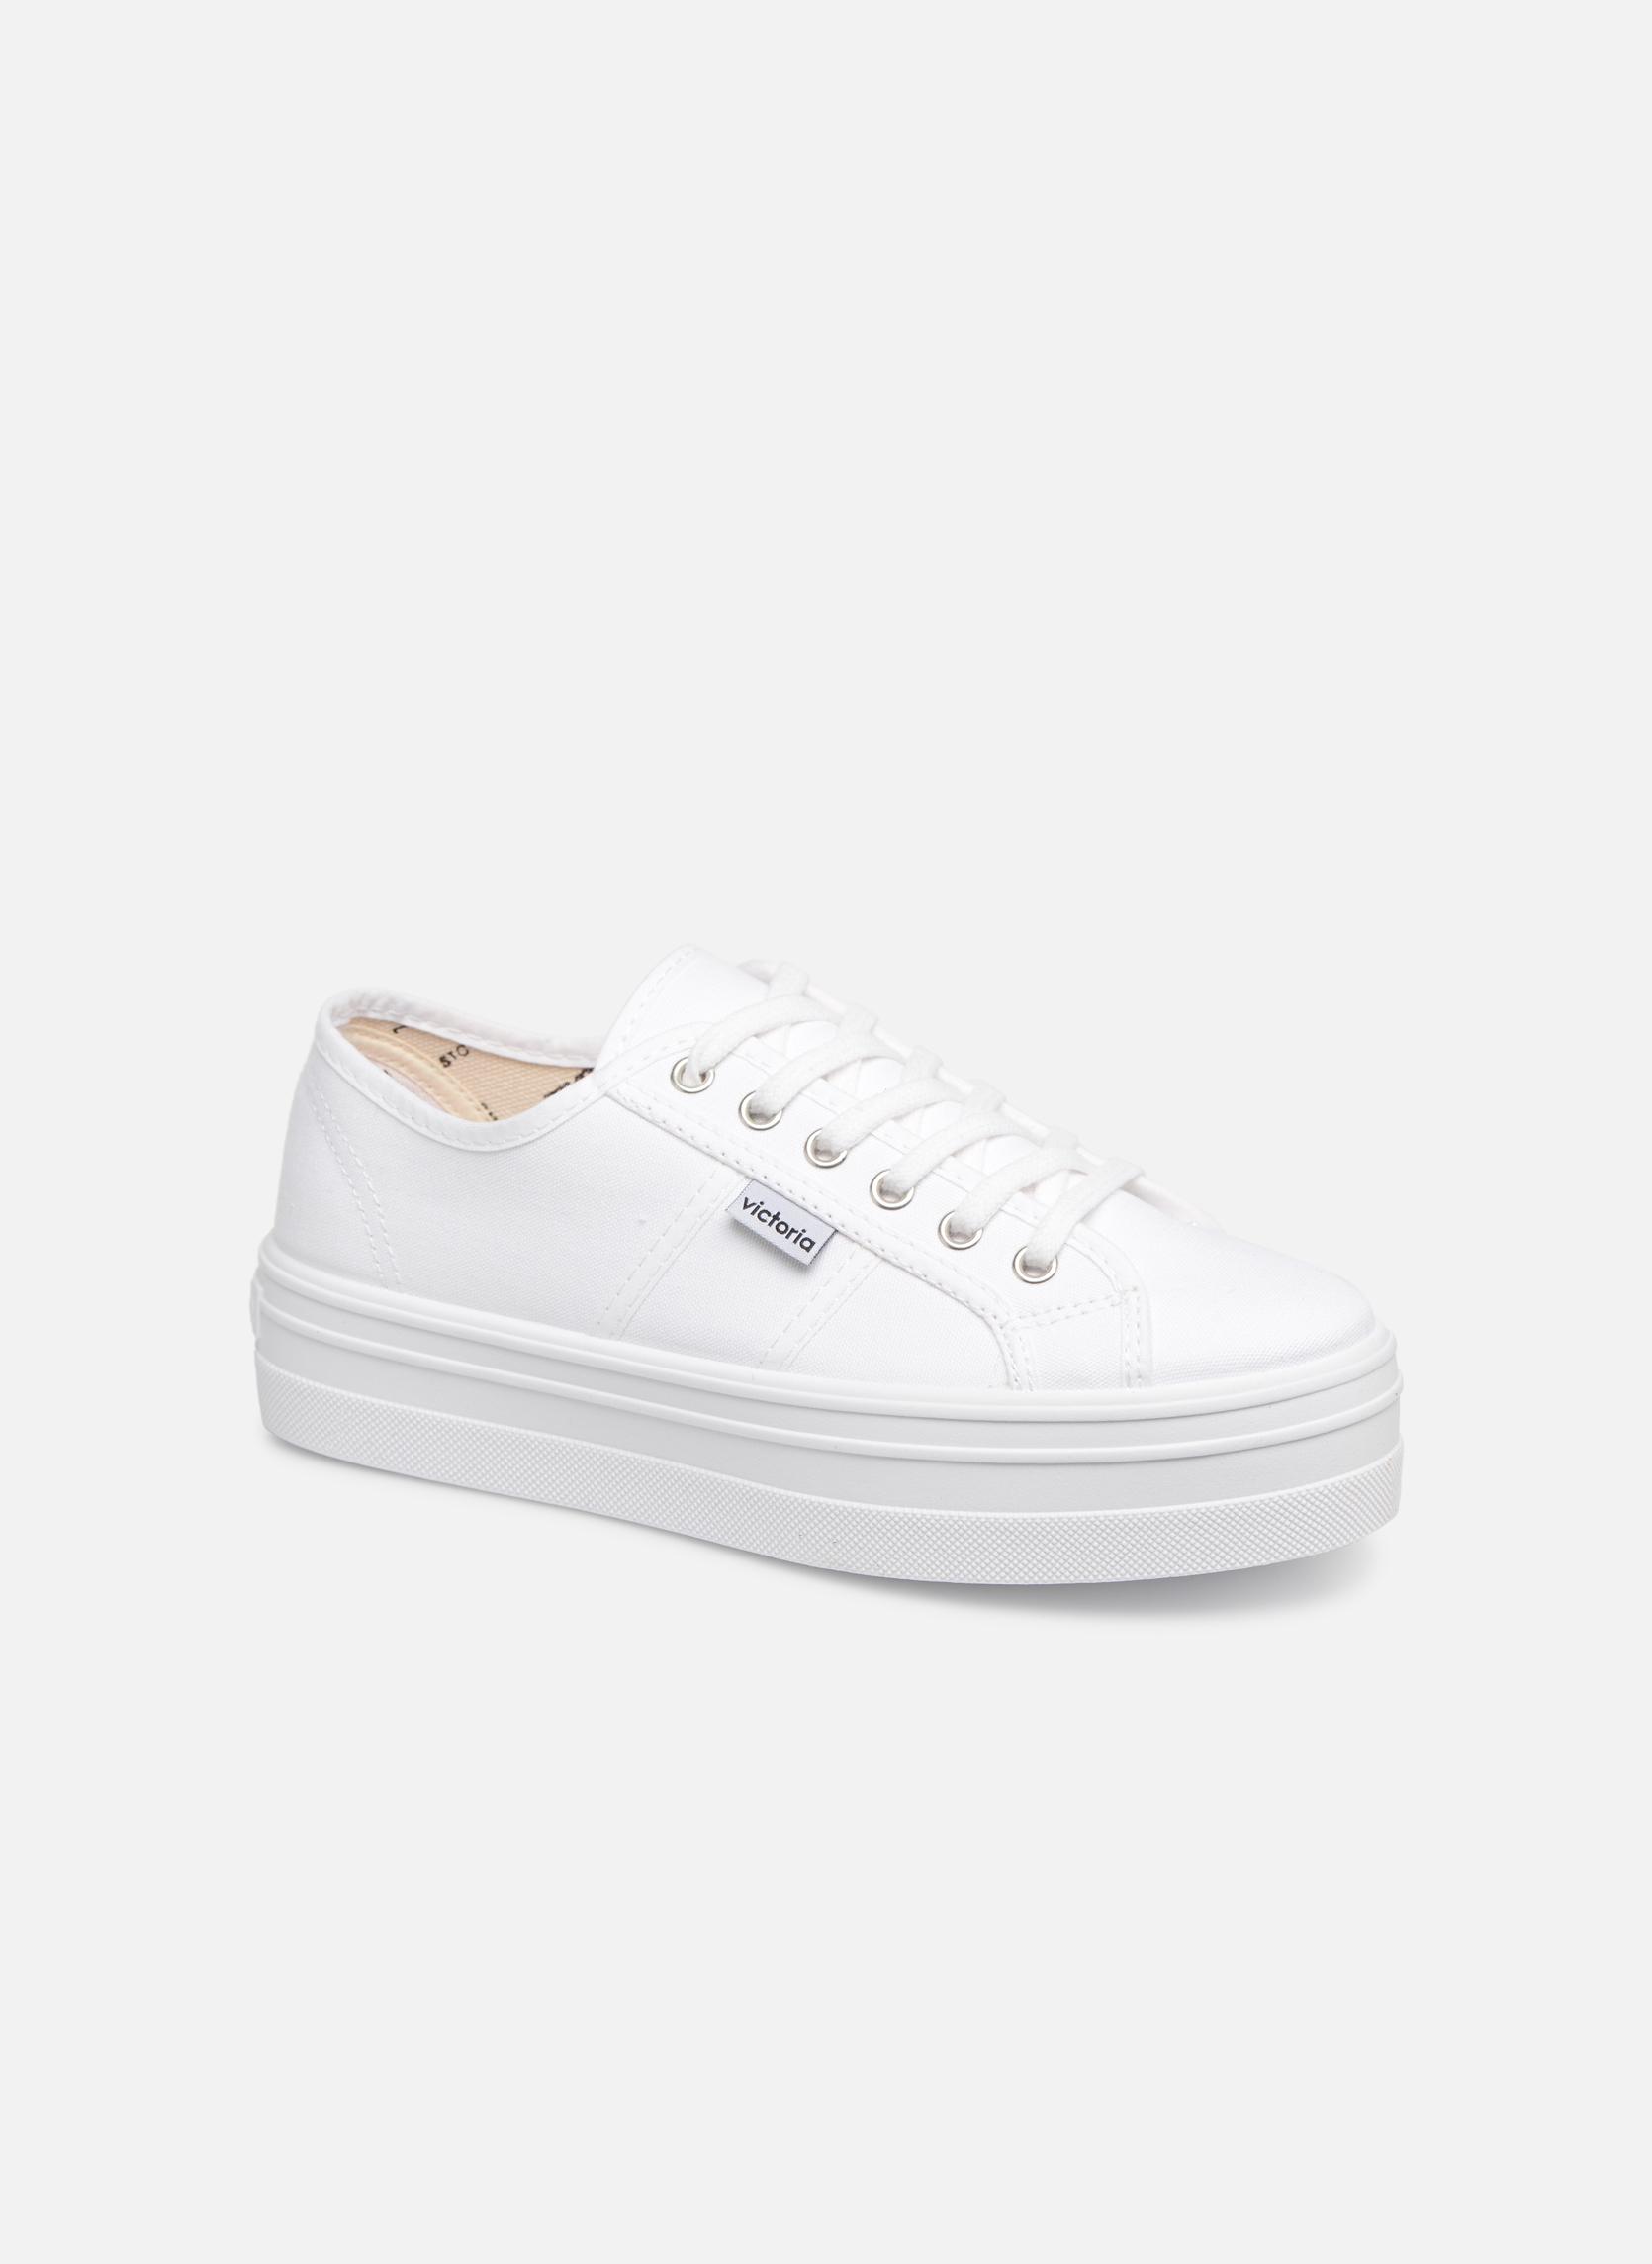 Blucher Lona Plataforma Blanco